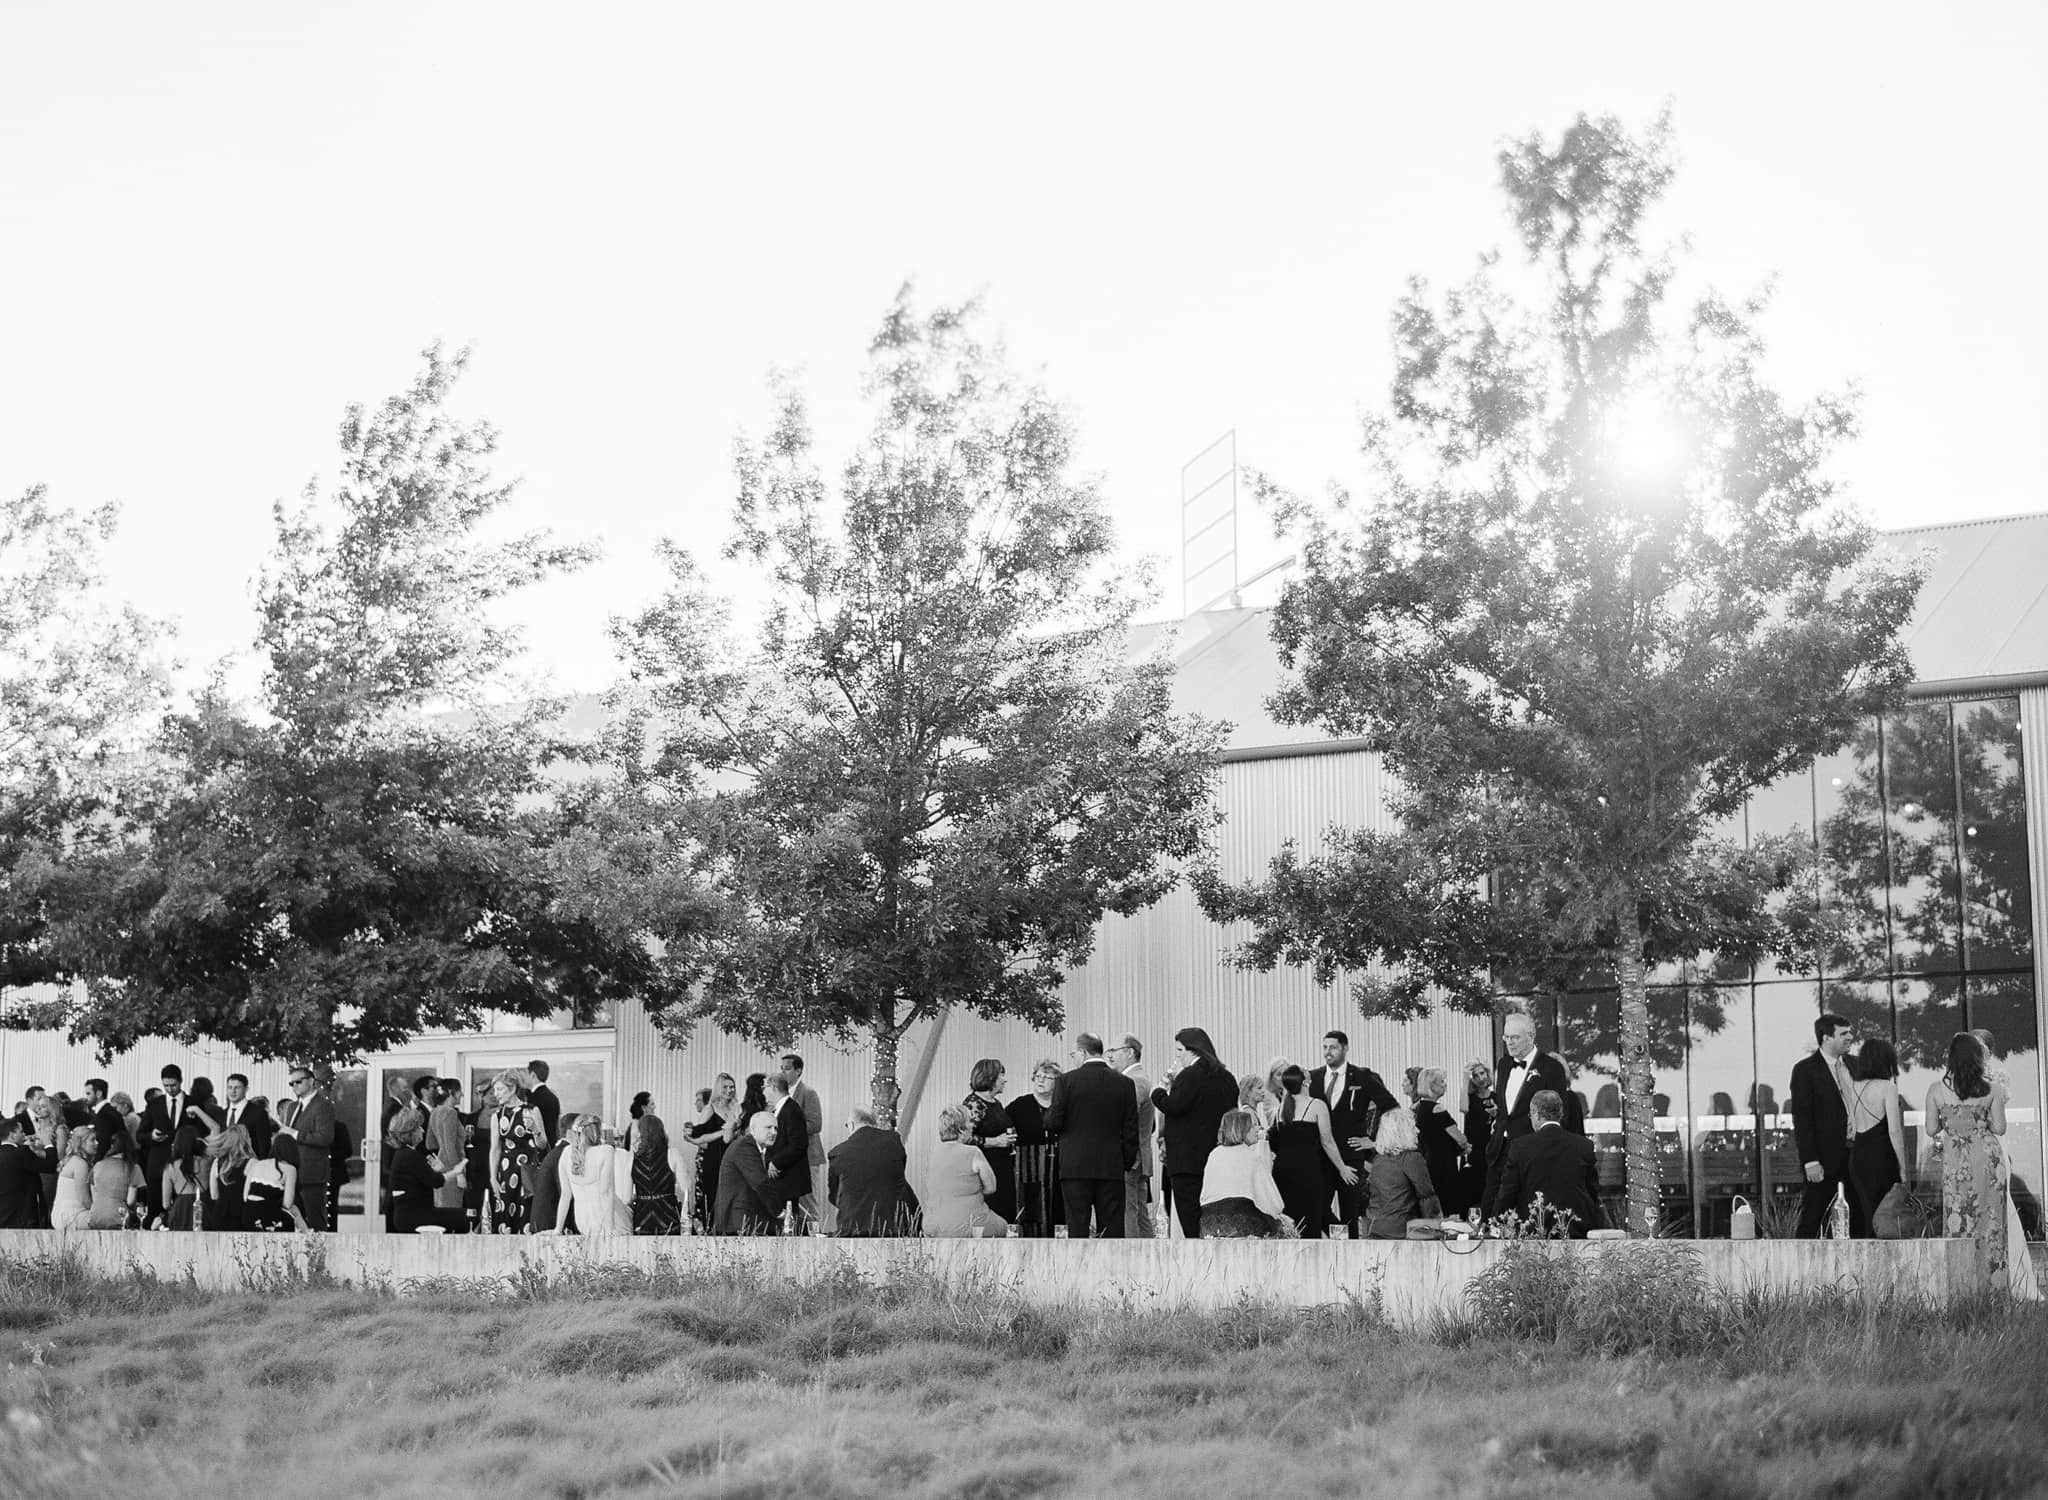 PROSPECT_HOUSE_WEDDING_AUSTIN_TX_MATTHEW_MOORE-00673-2.jpg